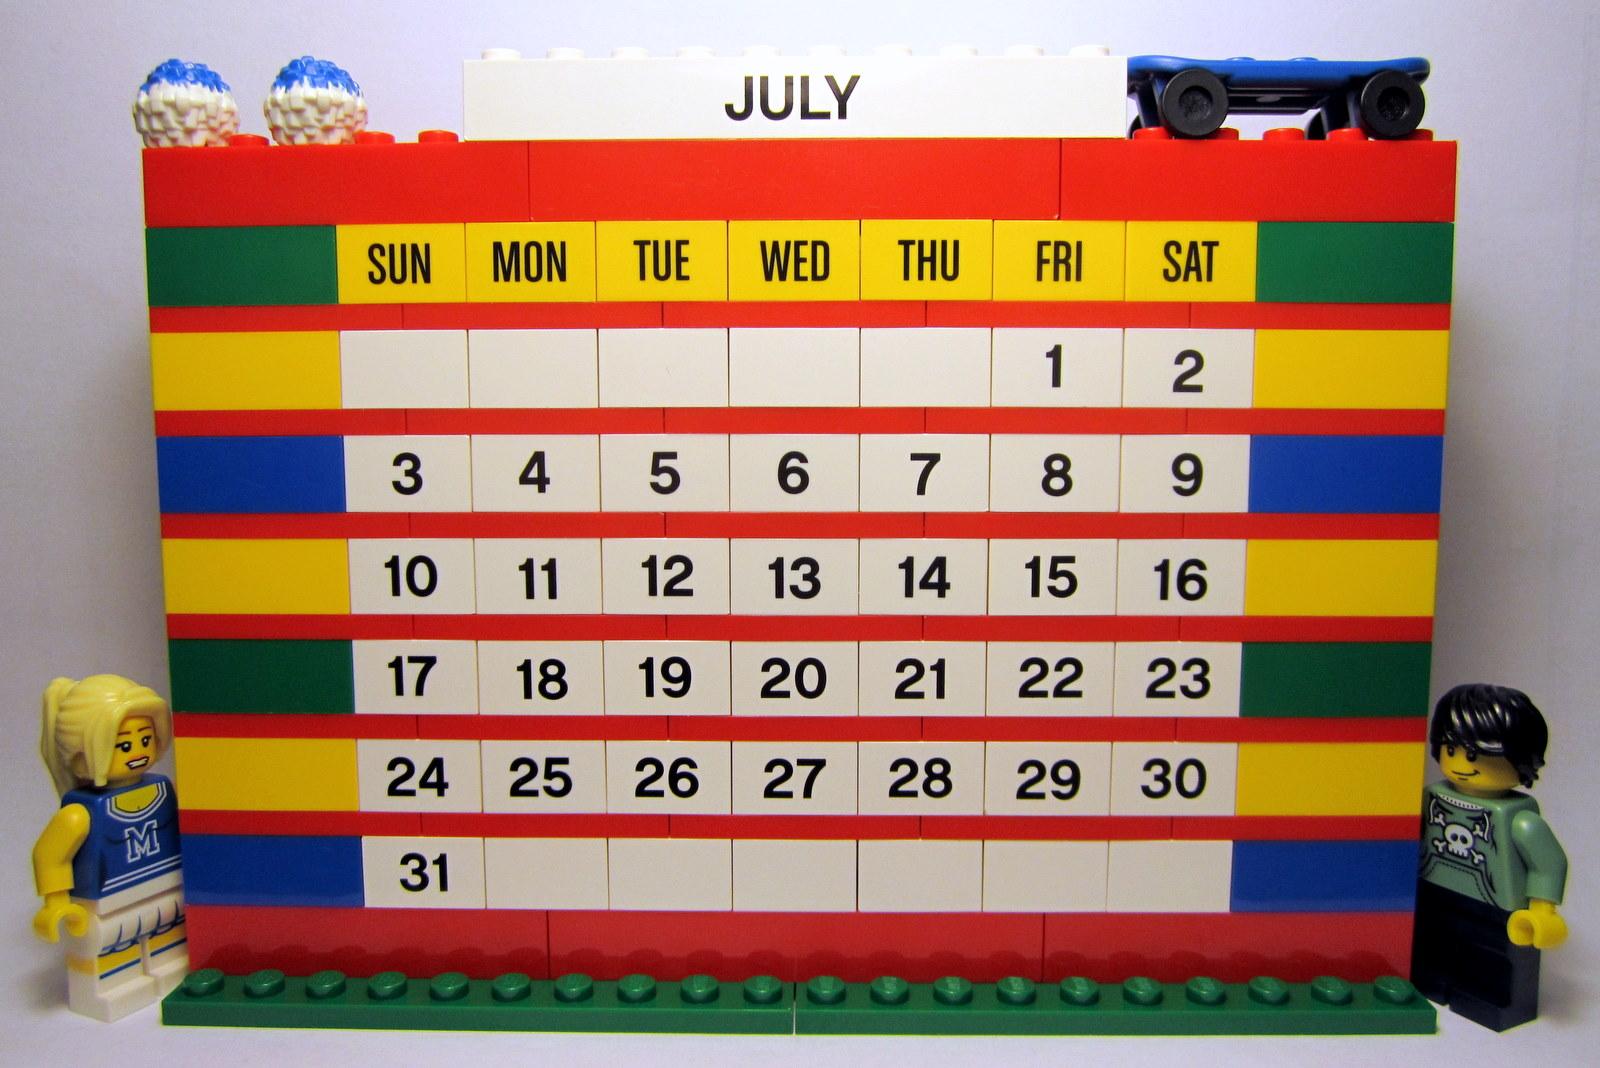 The Brick Brown Fox Lego 853195 Brick Calendar